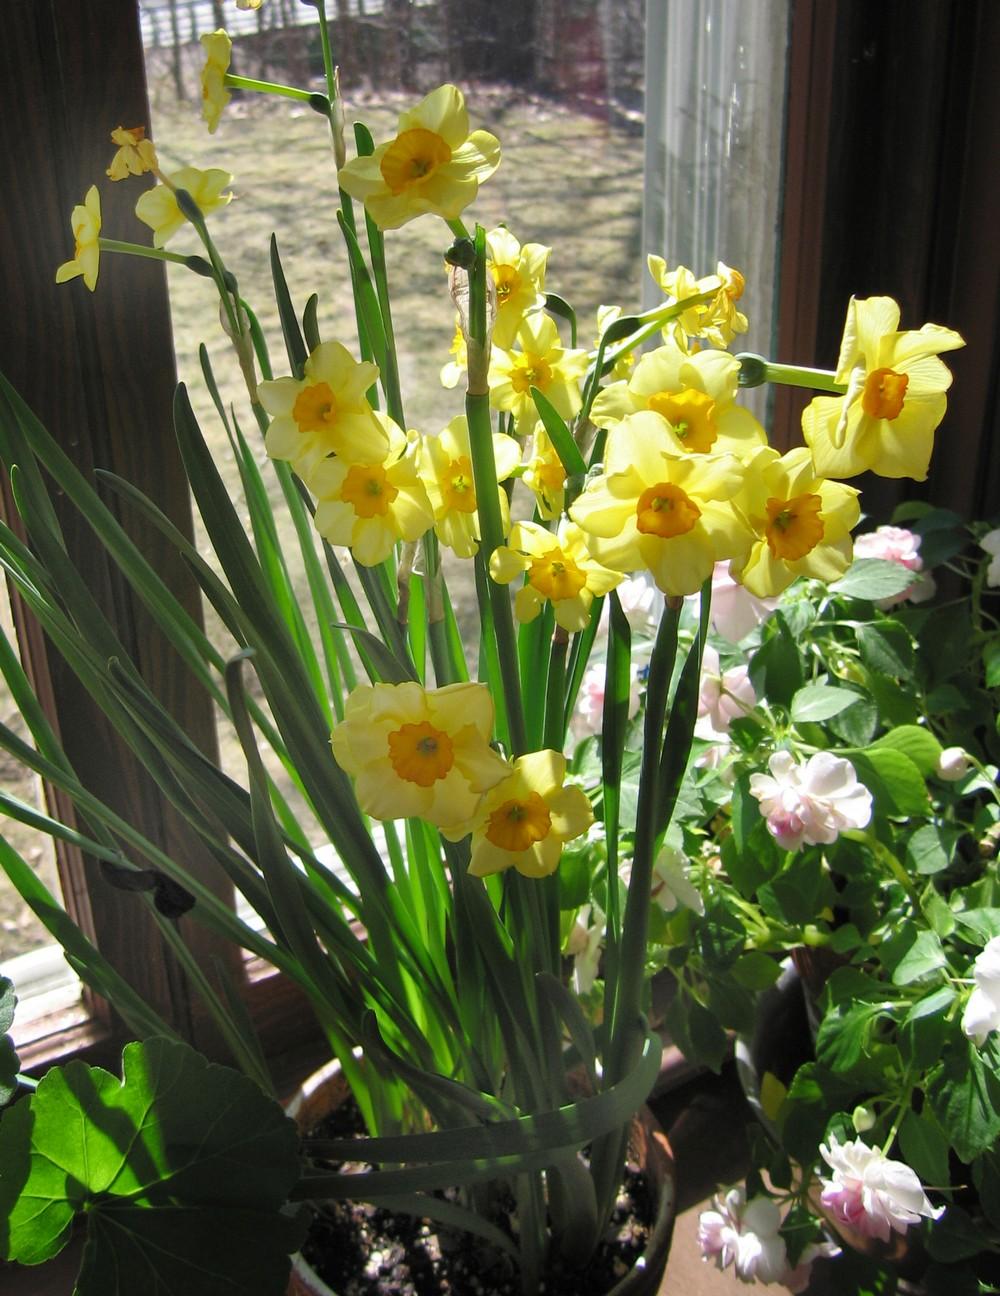 The Hardy Boys: Flowering Bulbs for Winter Windows